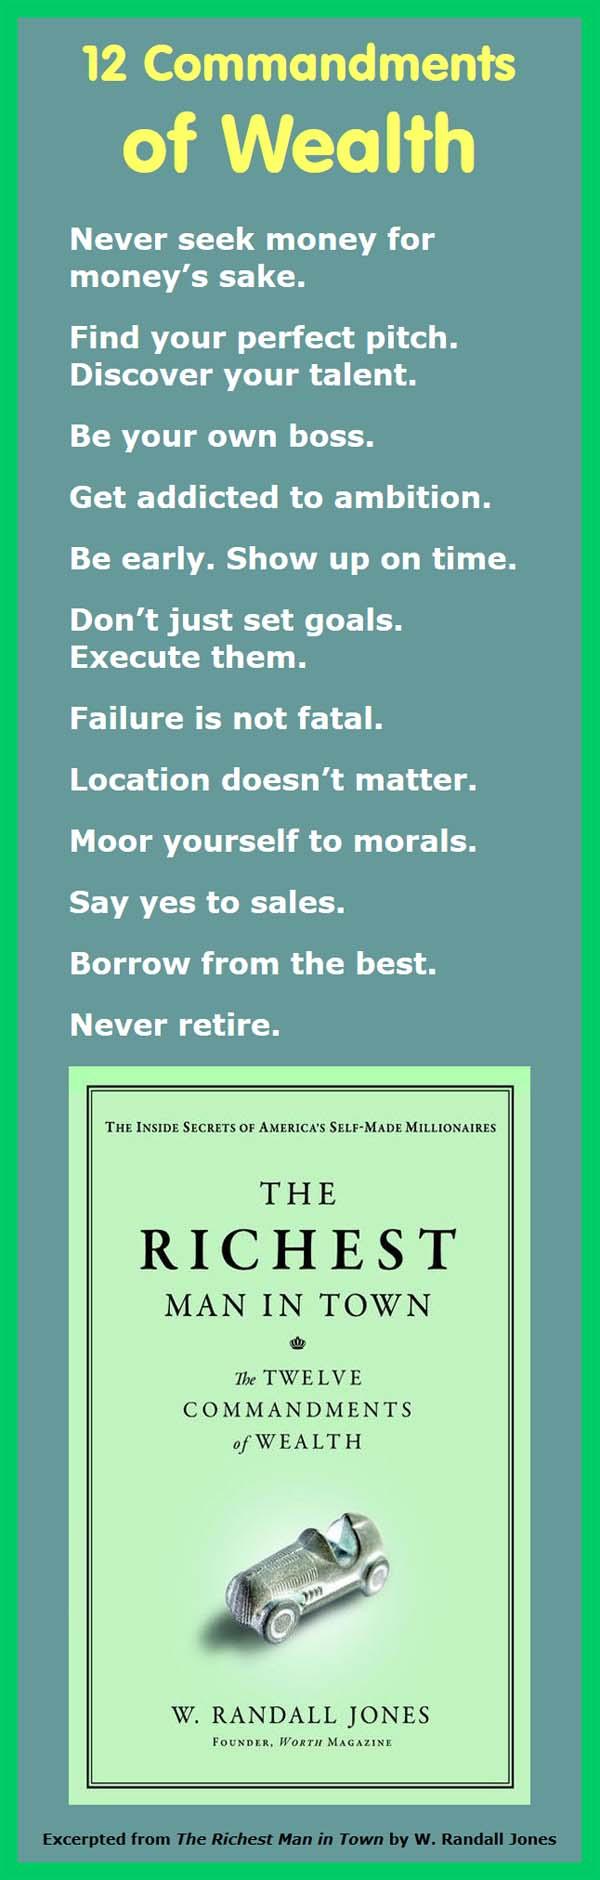 12 Commandments of Wealth